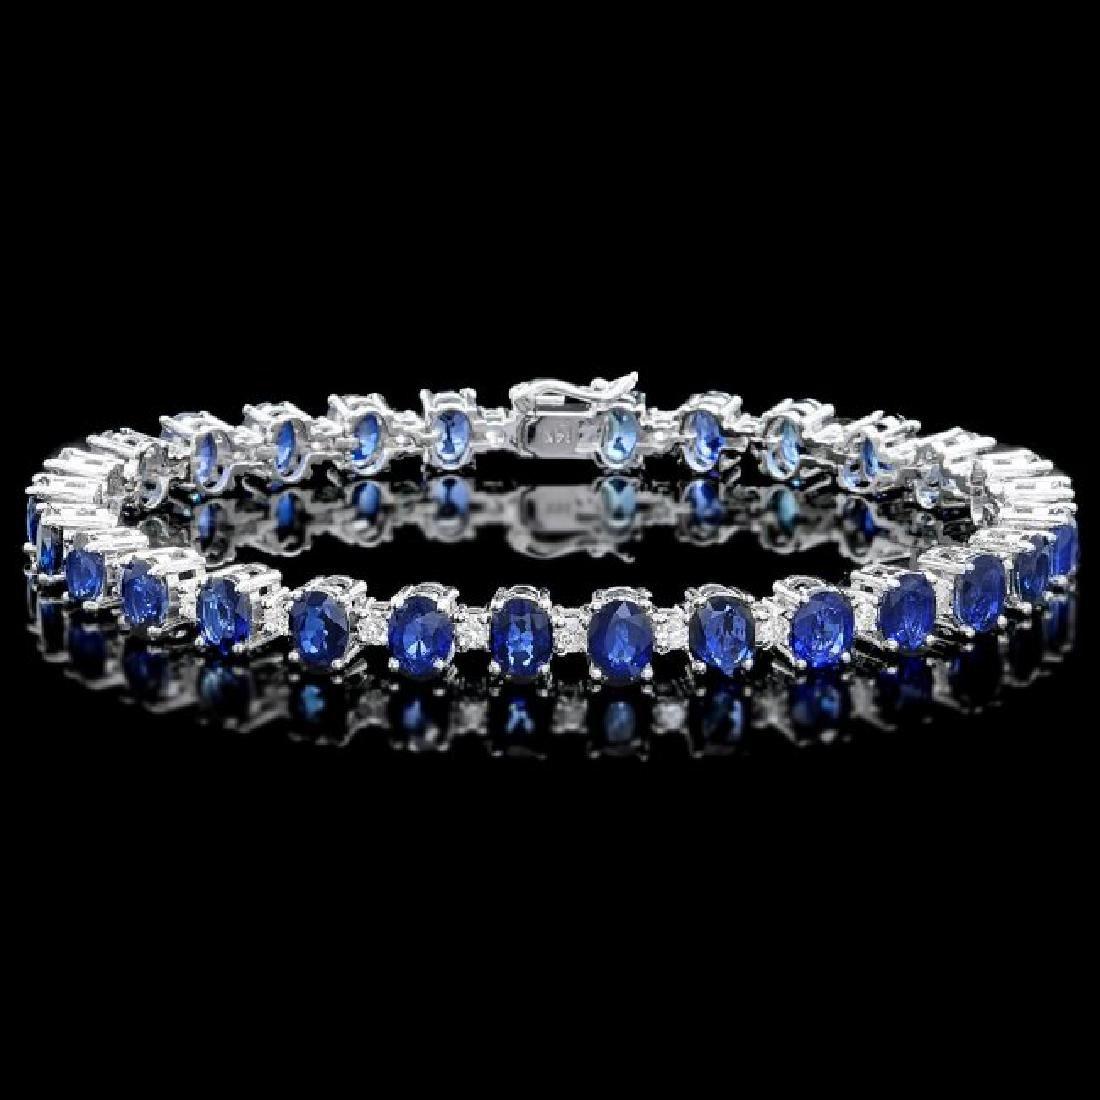 14k Gold 19.00ct Sapphire 2.00ct Diamond Bracelet